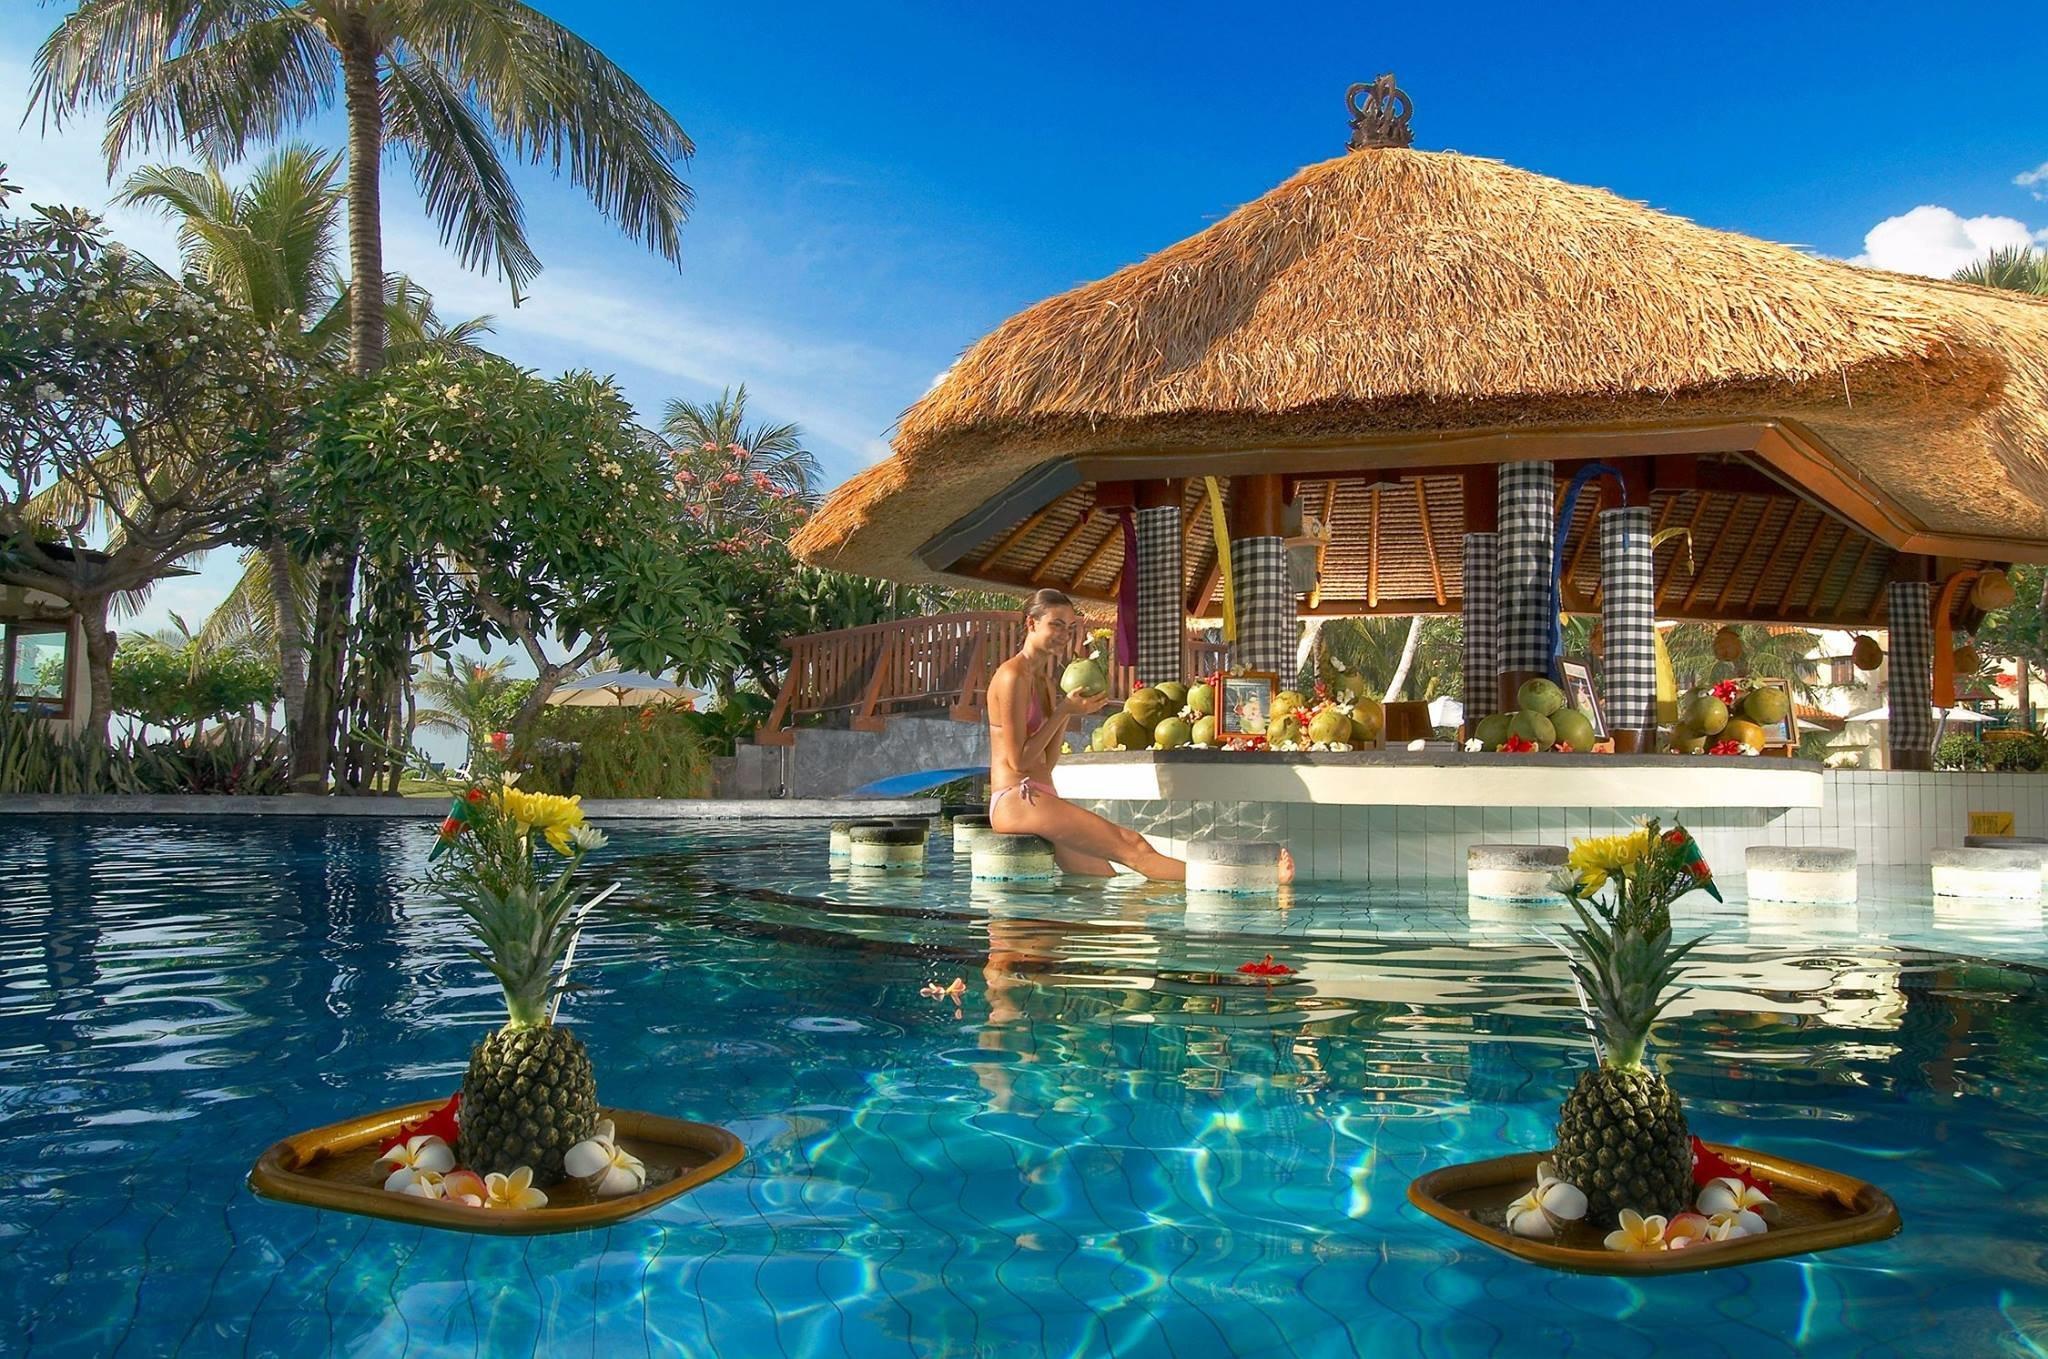 grand mirage bali resort bali accomodation holiday packages. Black Bedroom Furniture Sets. Home Design Ideas